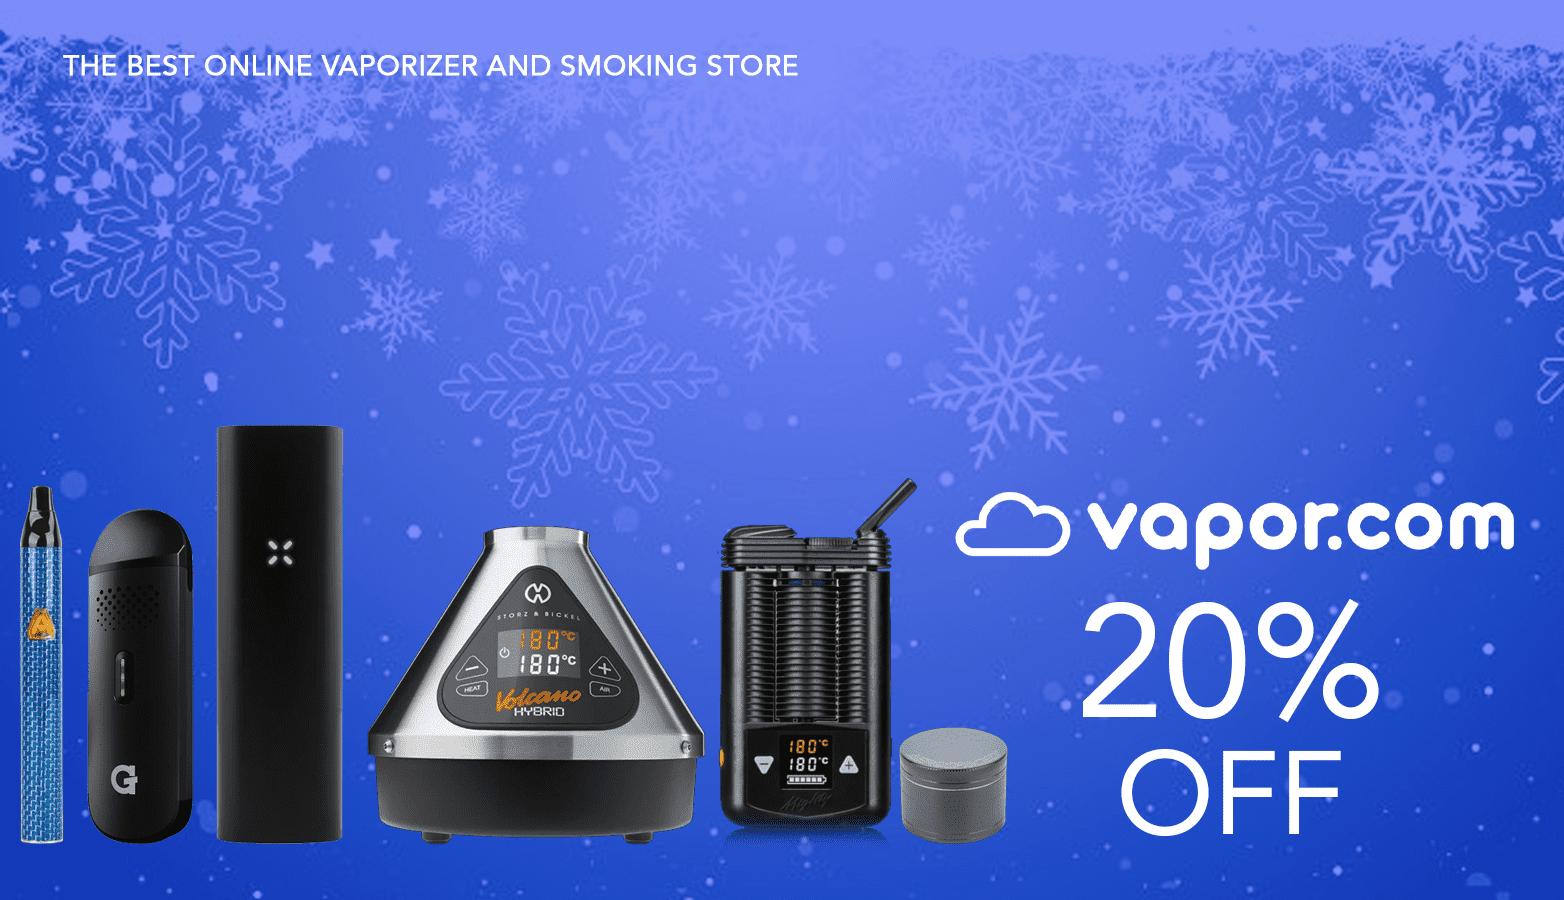 Vapor.com Promo 20 Percent Off